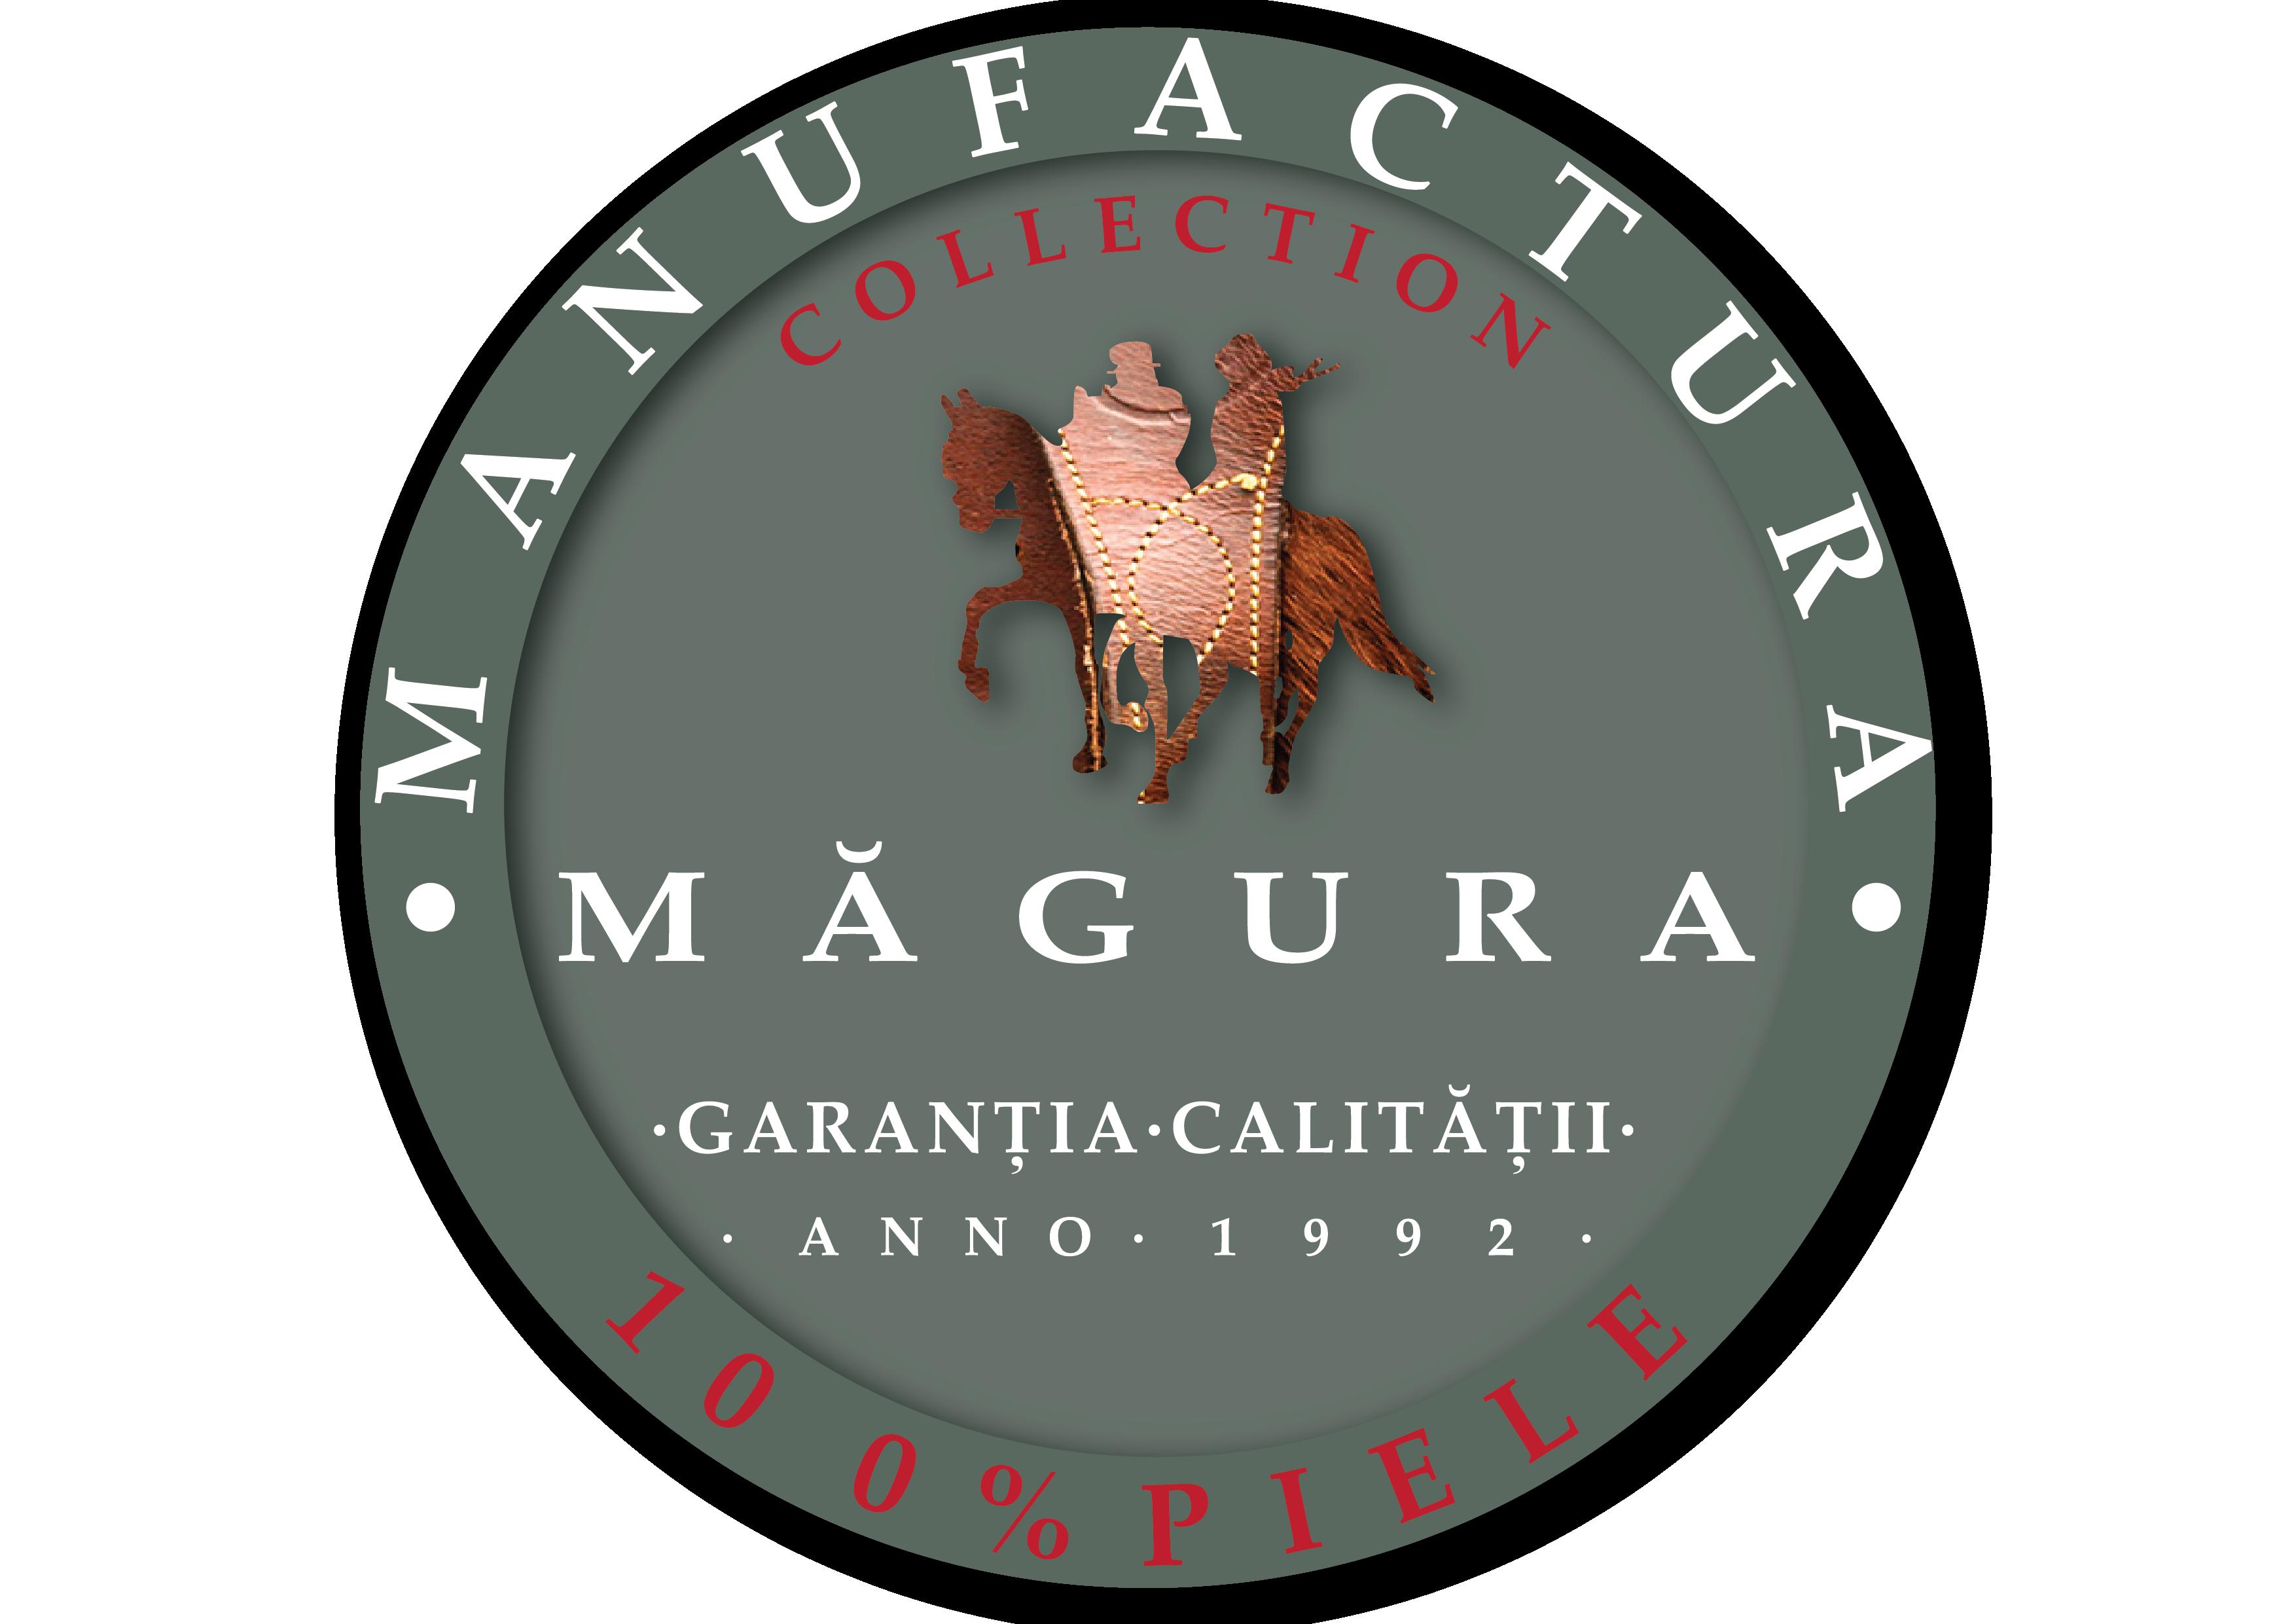 Manufactura Magura